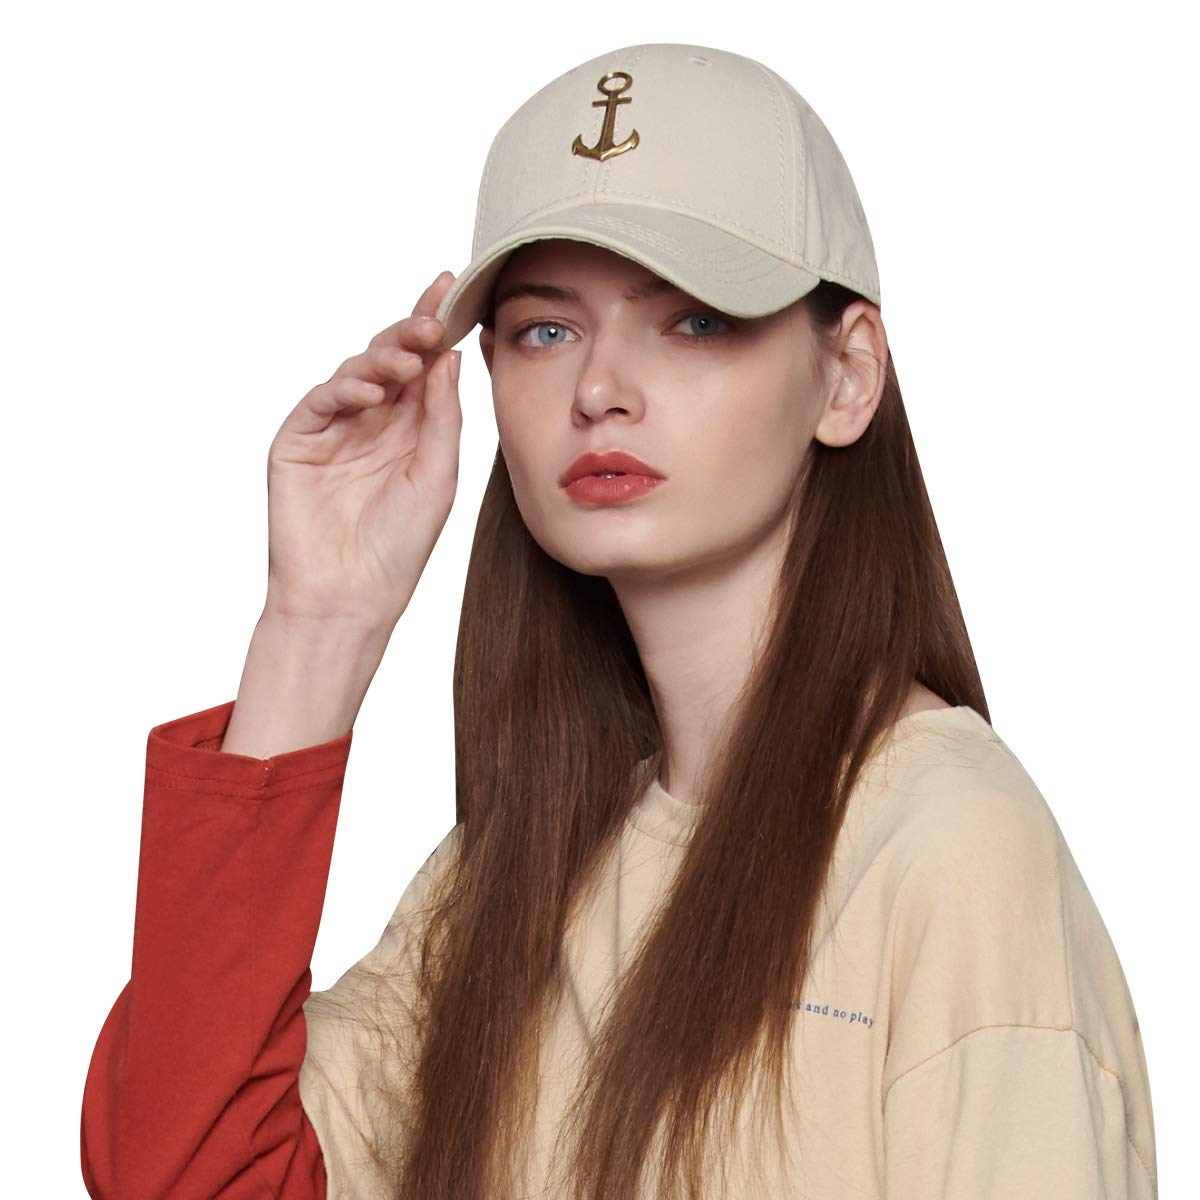 CACUSS Baseball Cap Women's Cotton Classic Plain Adjustable Dad Hat Fashionable Outdoor Sports Sun Hat